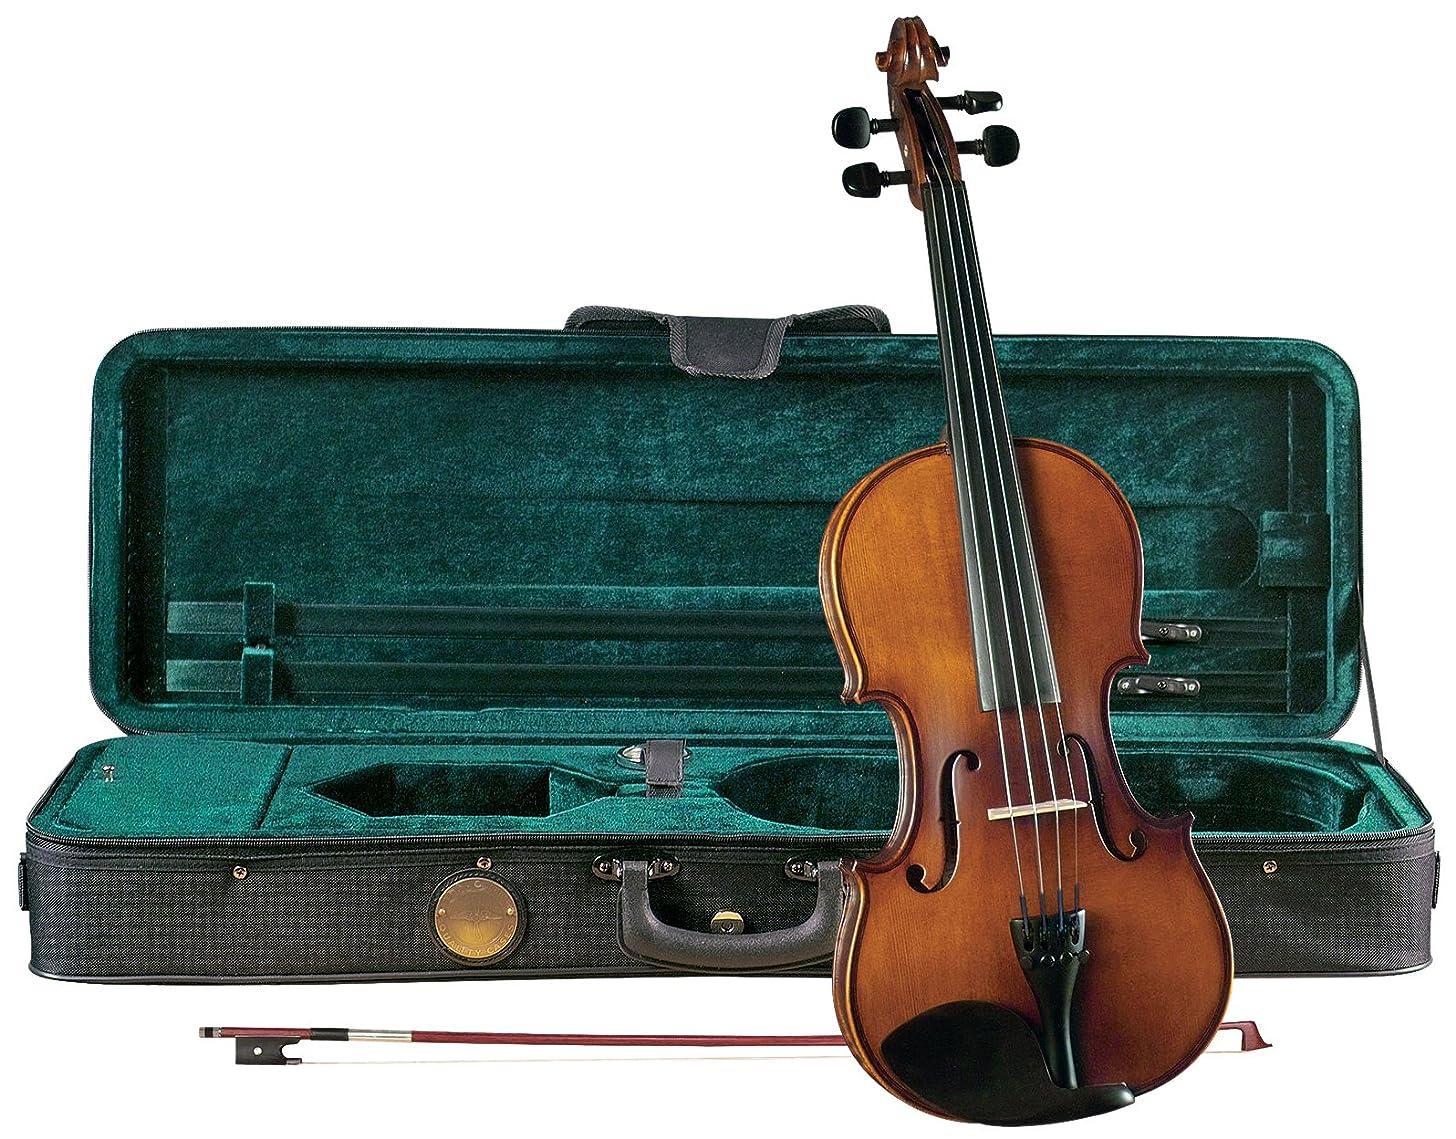 Cremona SV-225 Premier Student Violin Outfit - 4/4 Size